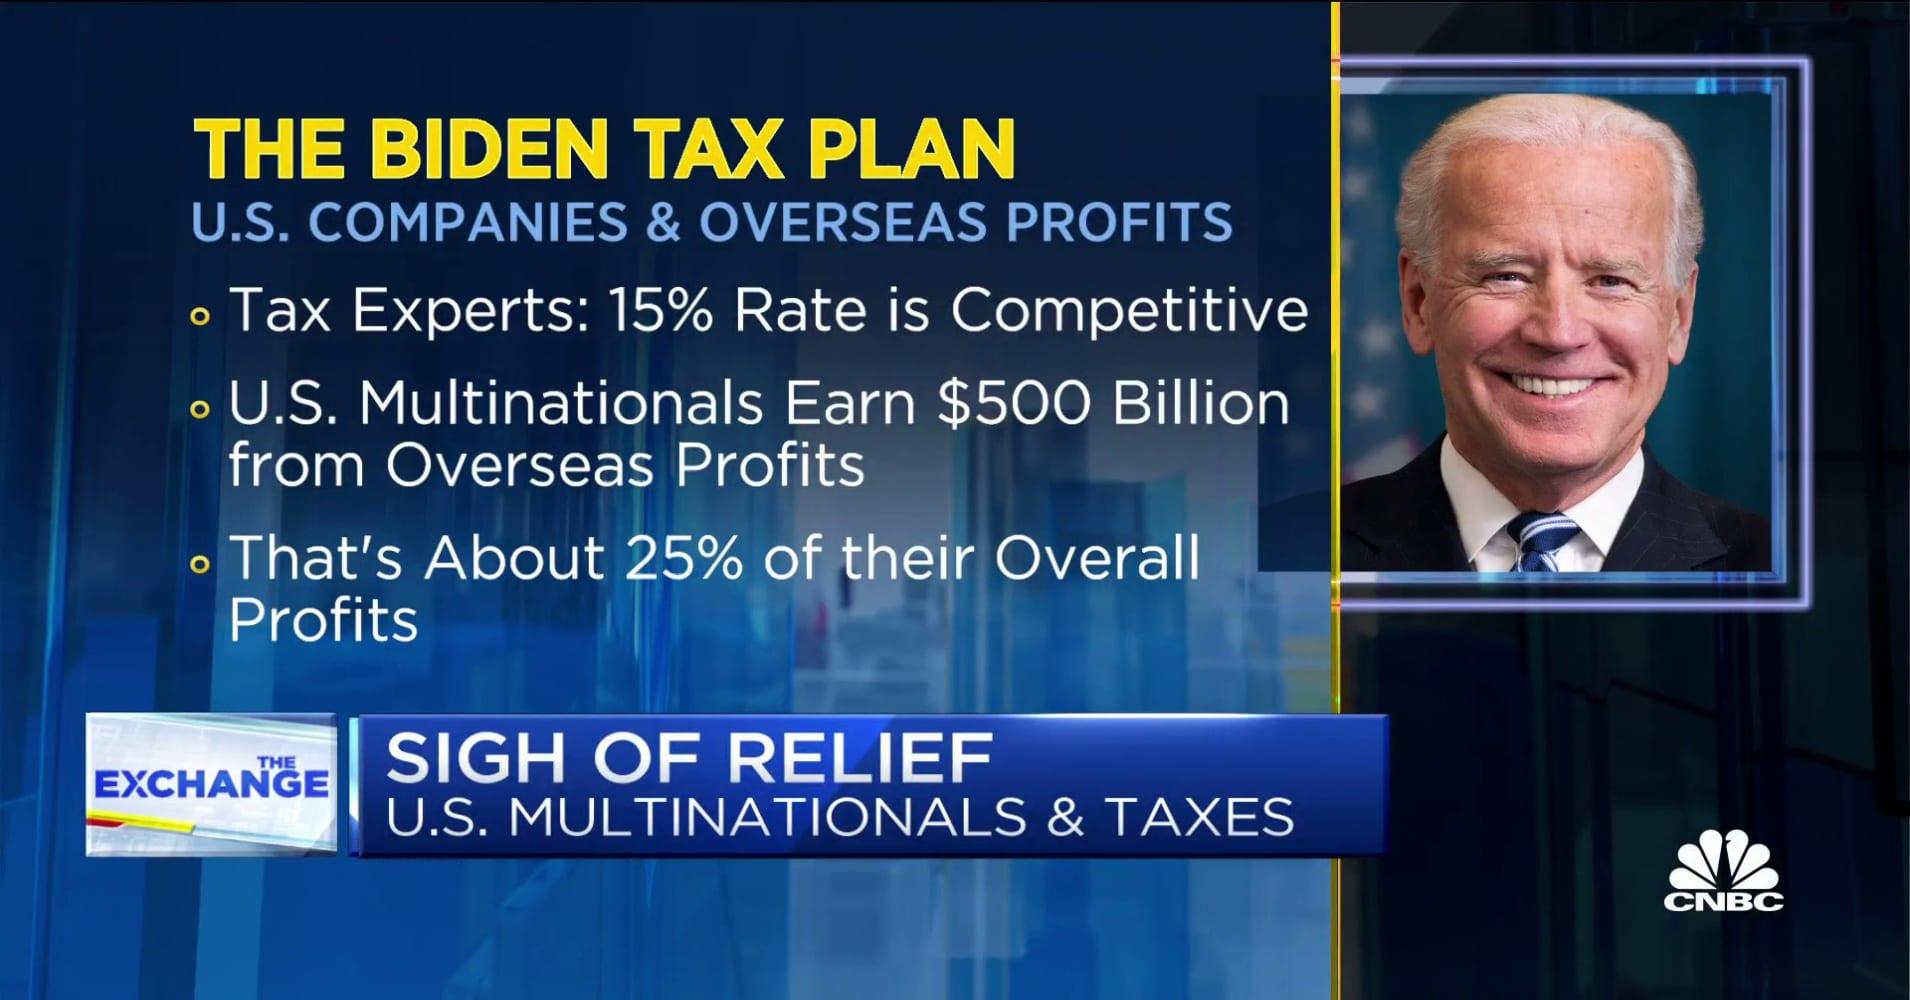 How Biden's tax plan may impact U.S. companies and overseas profits